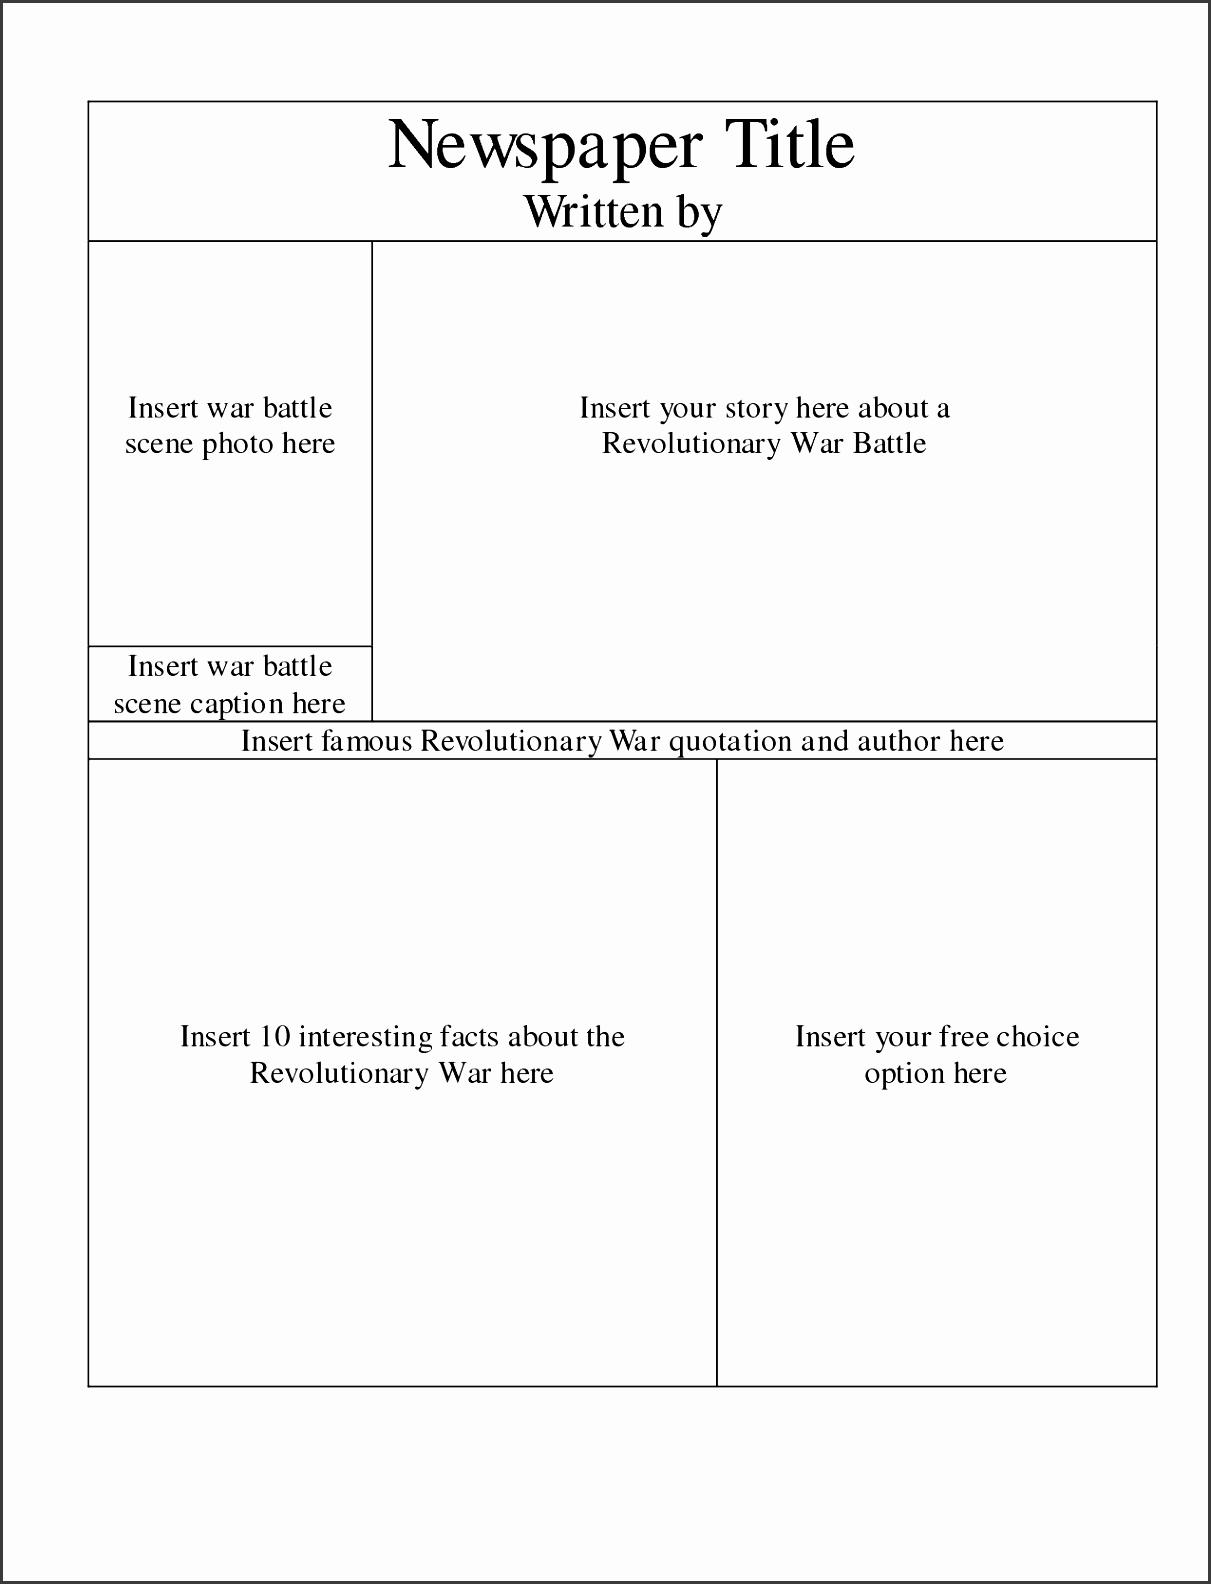 9 Newspaper Template For Free SampleTemplatess SampleTemplatess